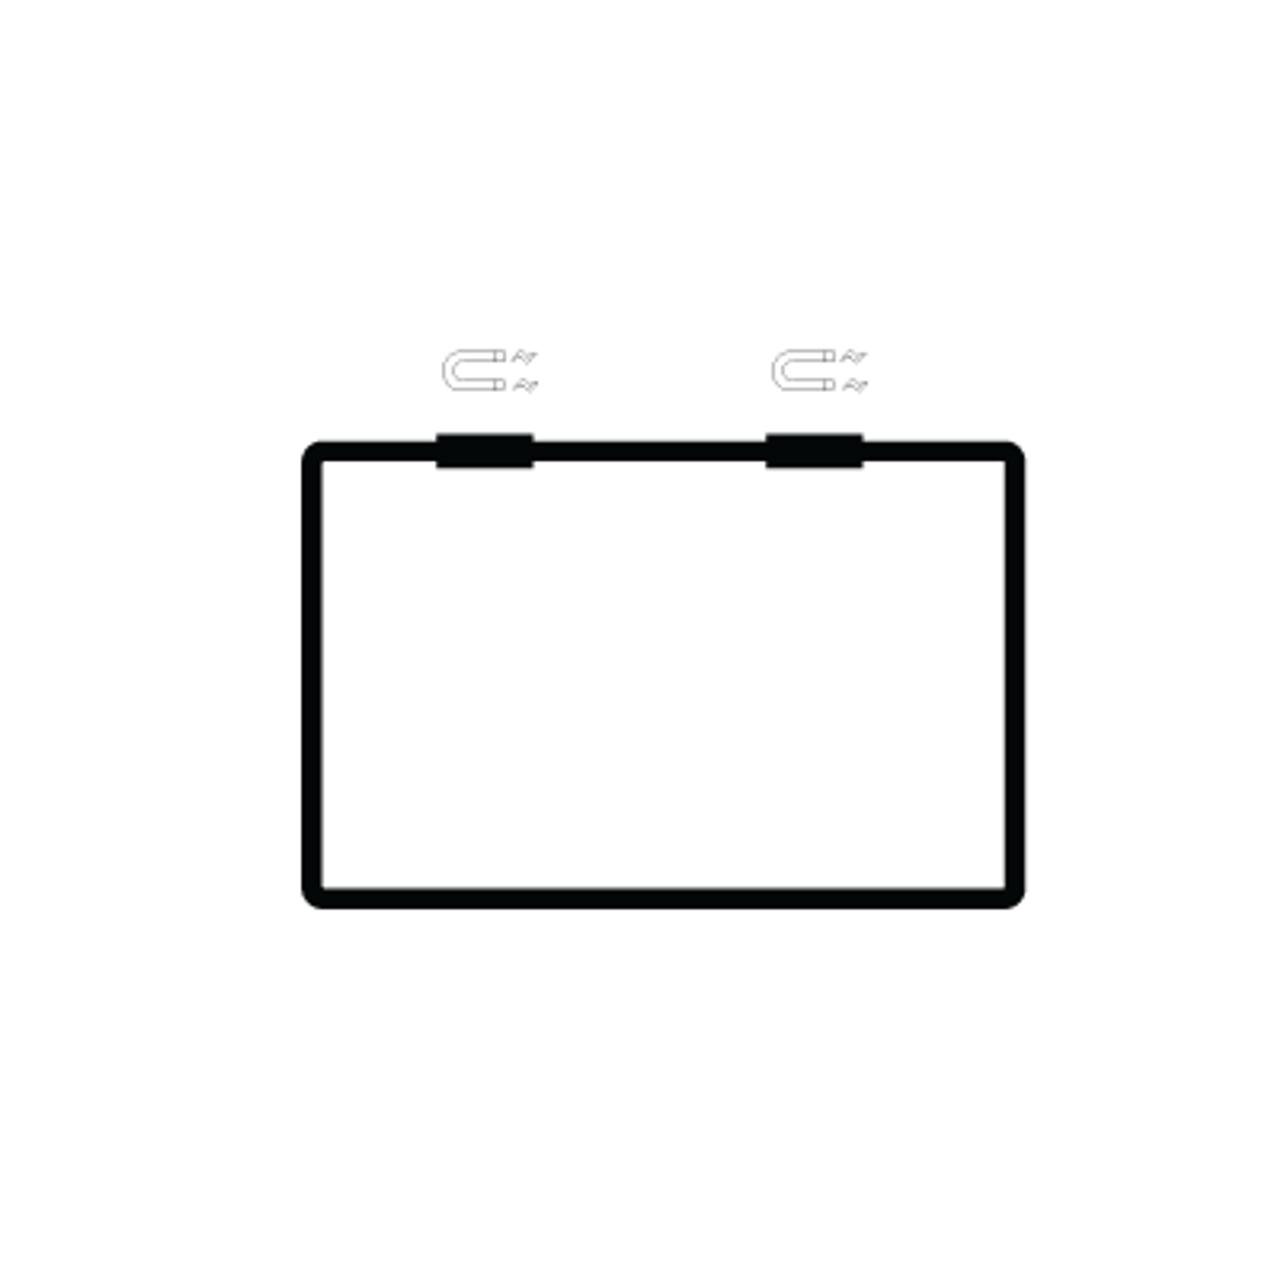 "Hanging Magnetic Mount Sign frame - Black Finish - Fits 11""w x 7""h Sign Insert"